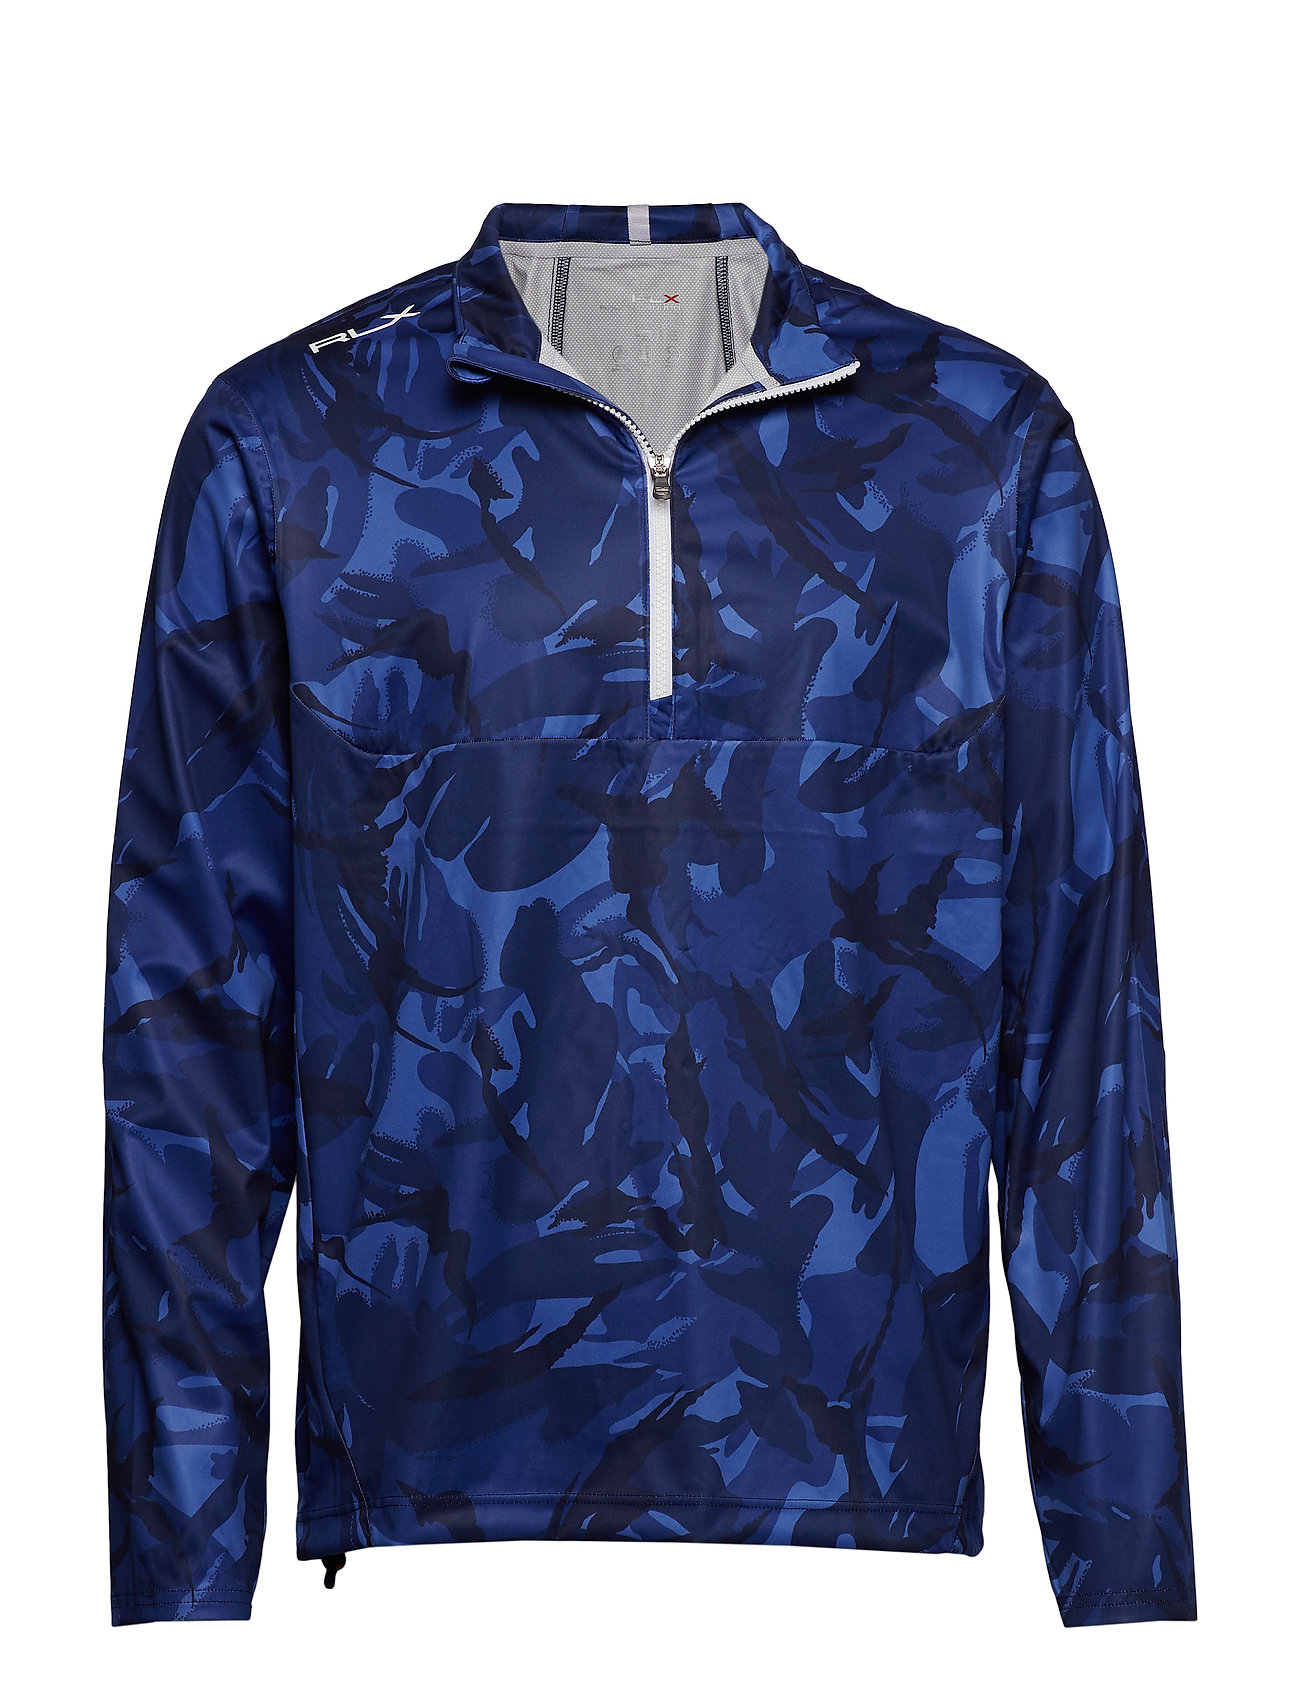 Ralph Lauren Golf Paneled Interlock Golf Jacket - BLUE ELMWOOD CAMO